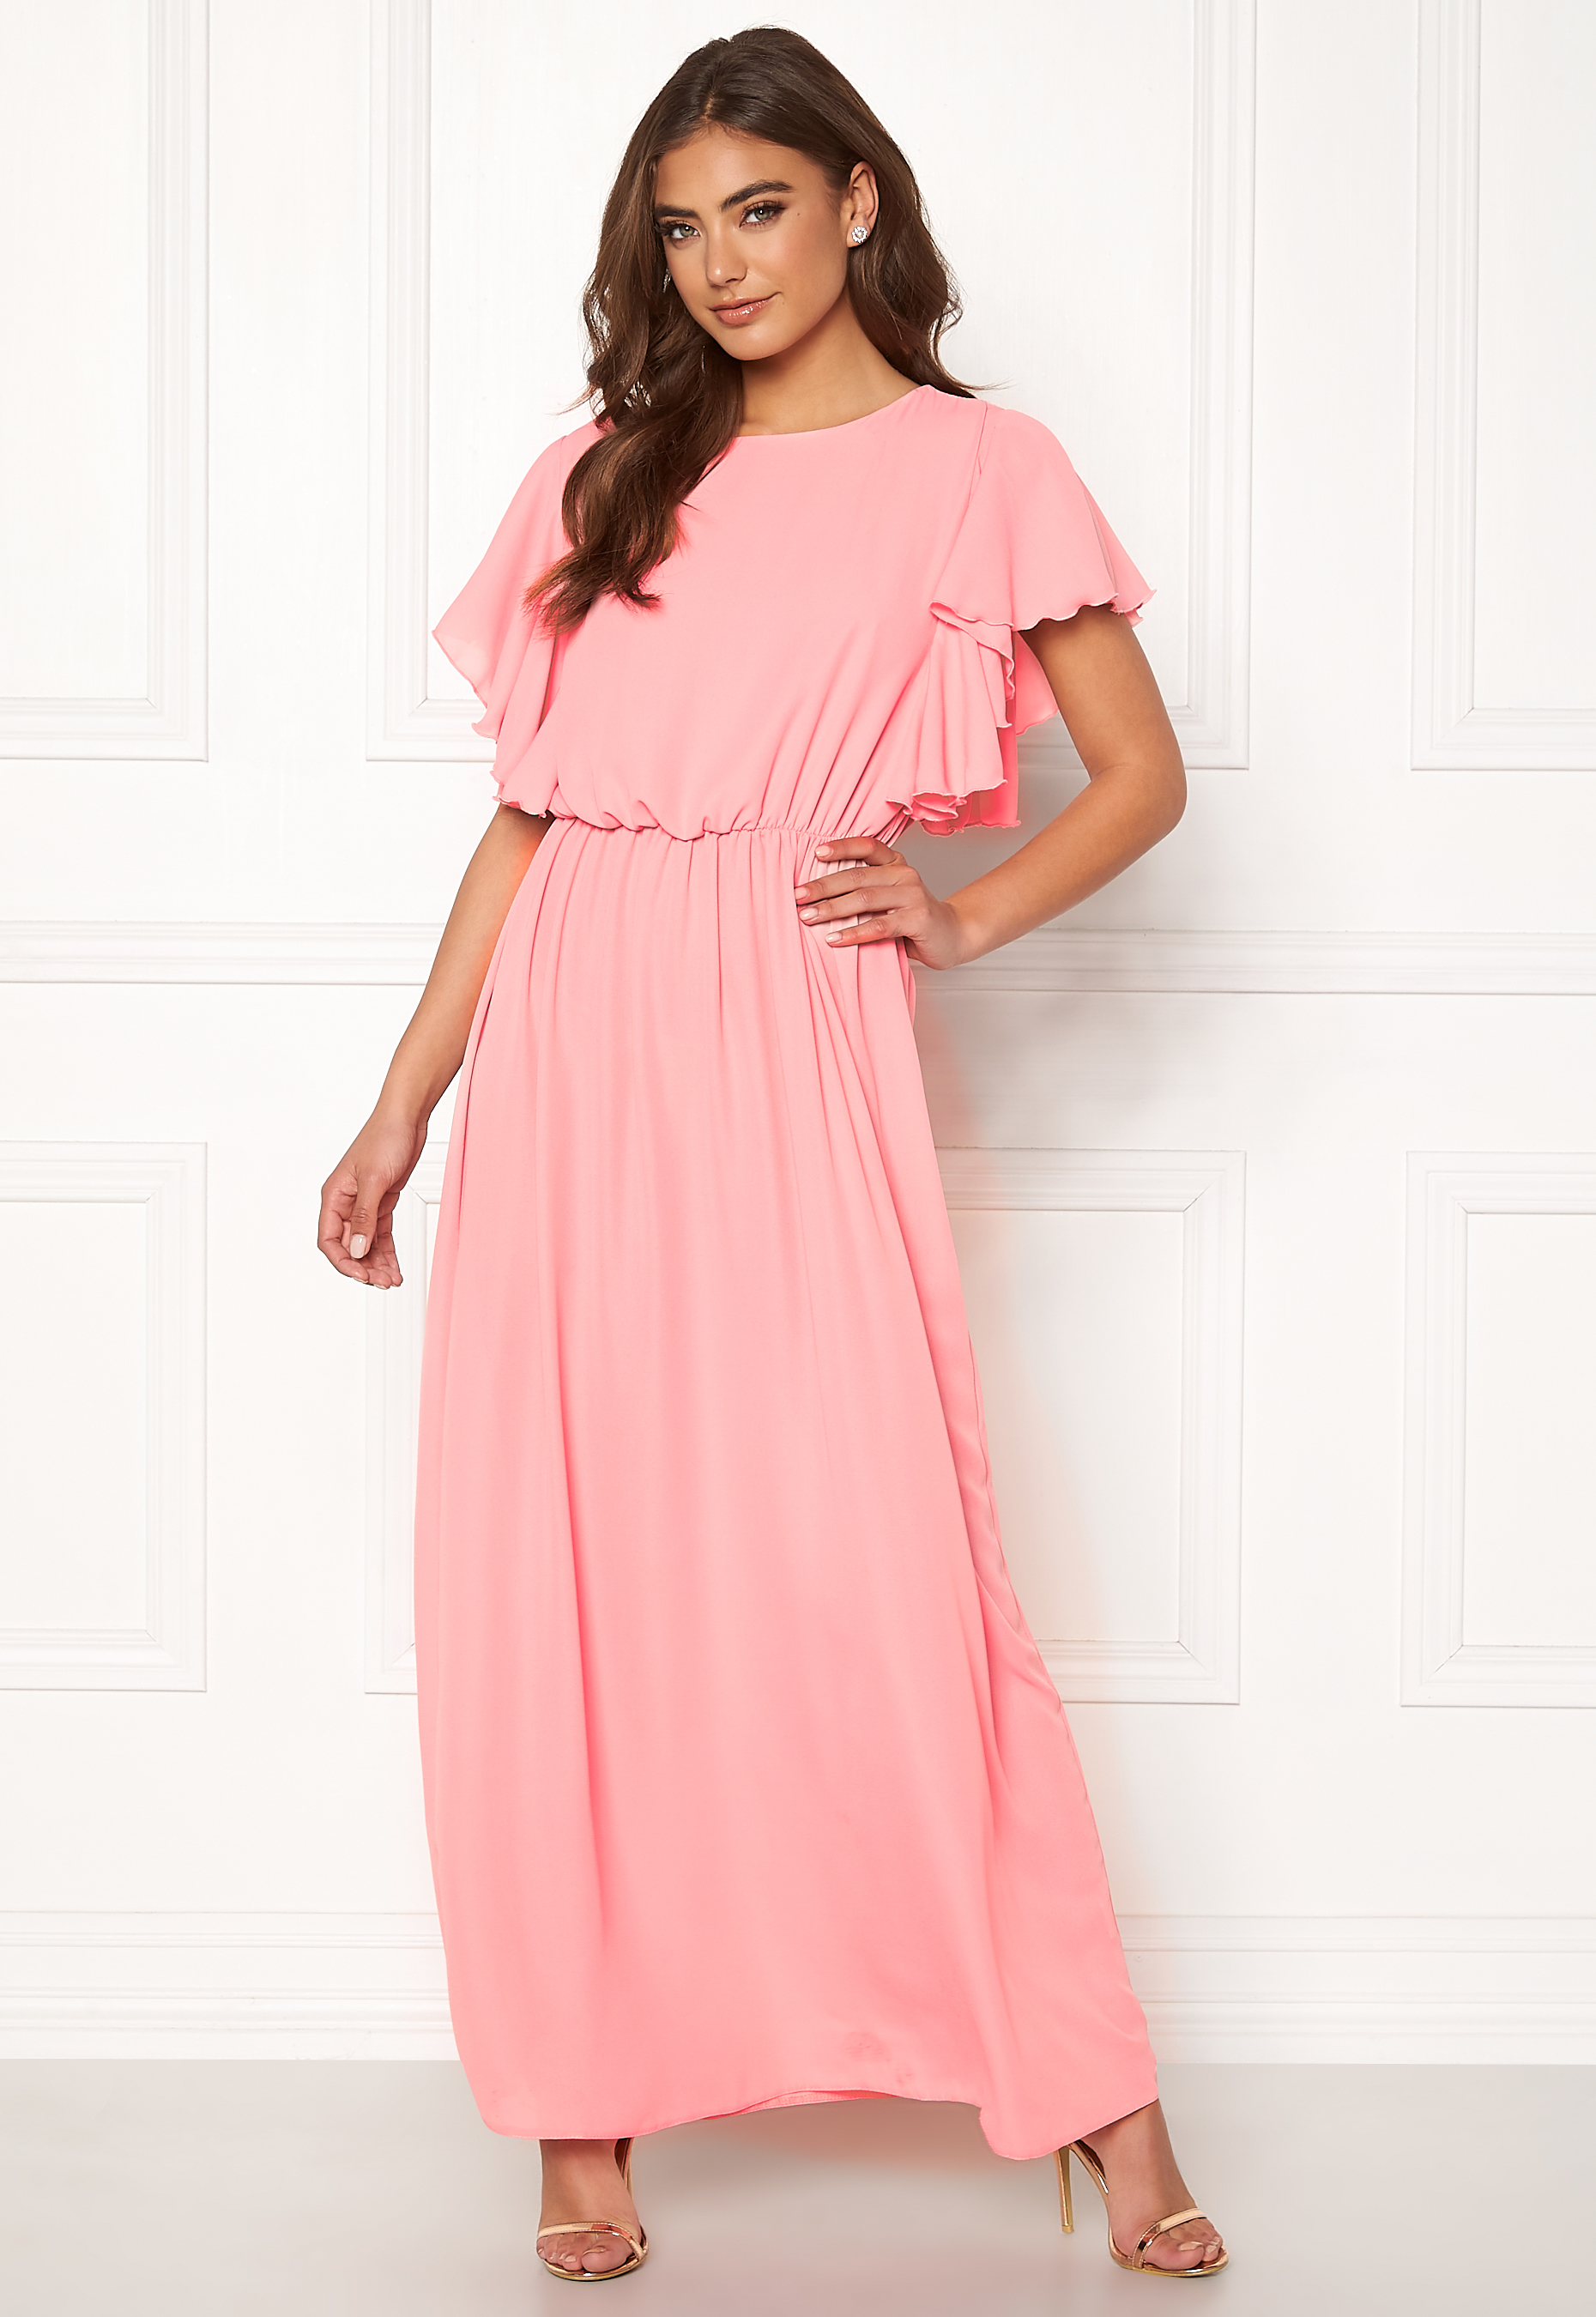 64915d954cf John Zack Frill Sleeve Maxi Dress Rose Pink - Bubbleroom